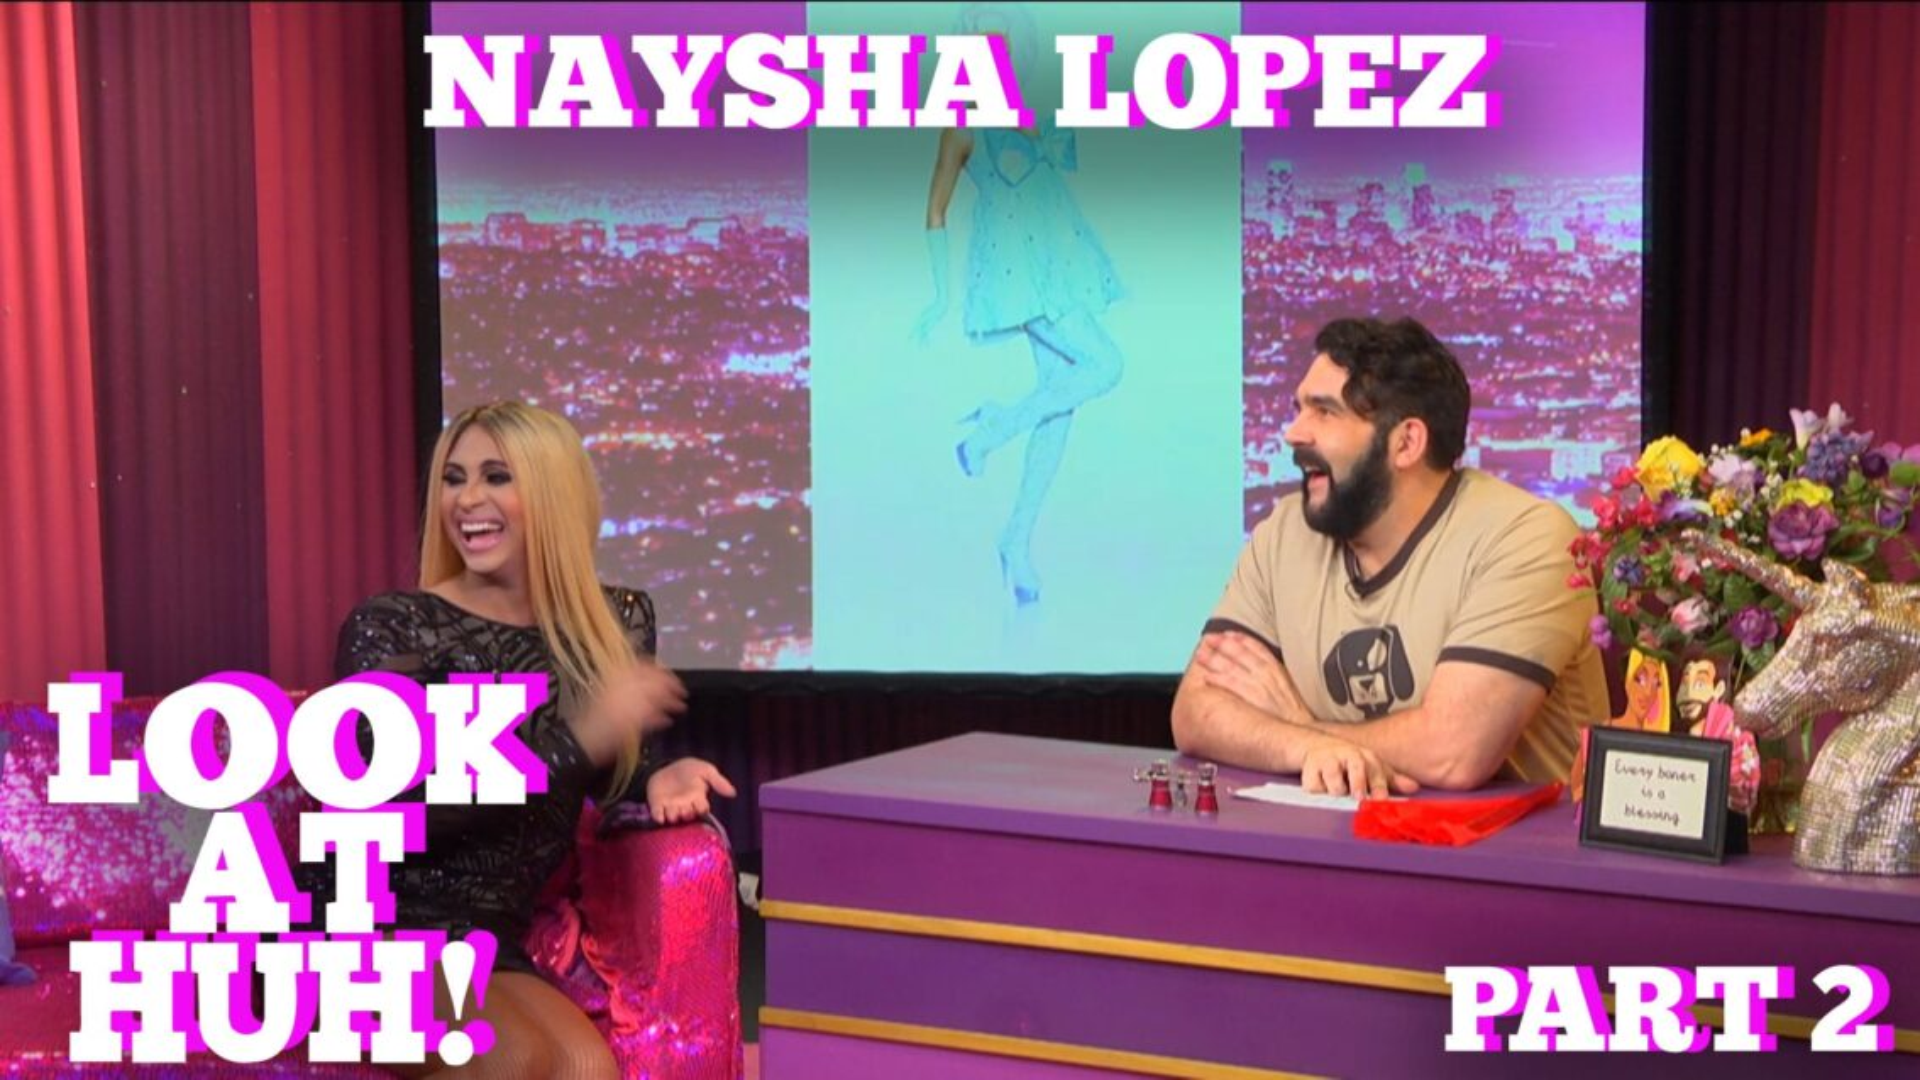 NAYSHA LOPEZ on LOOK AT HUH! Part 2